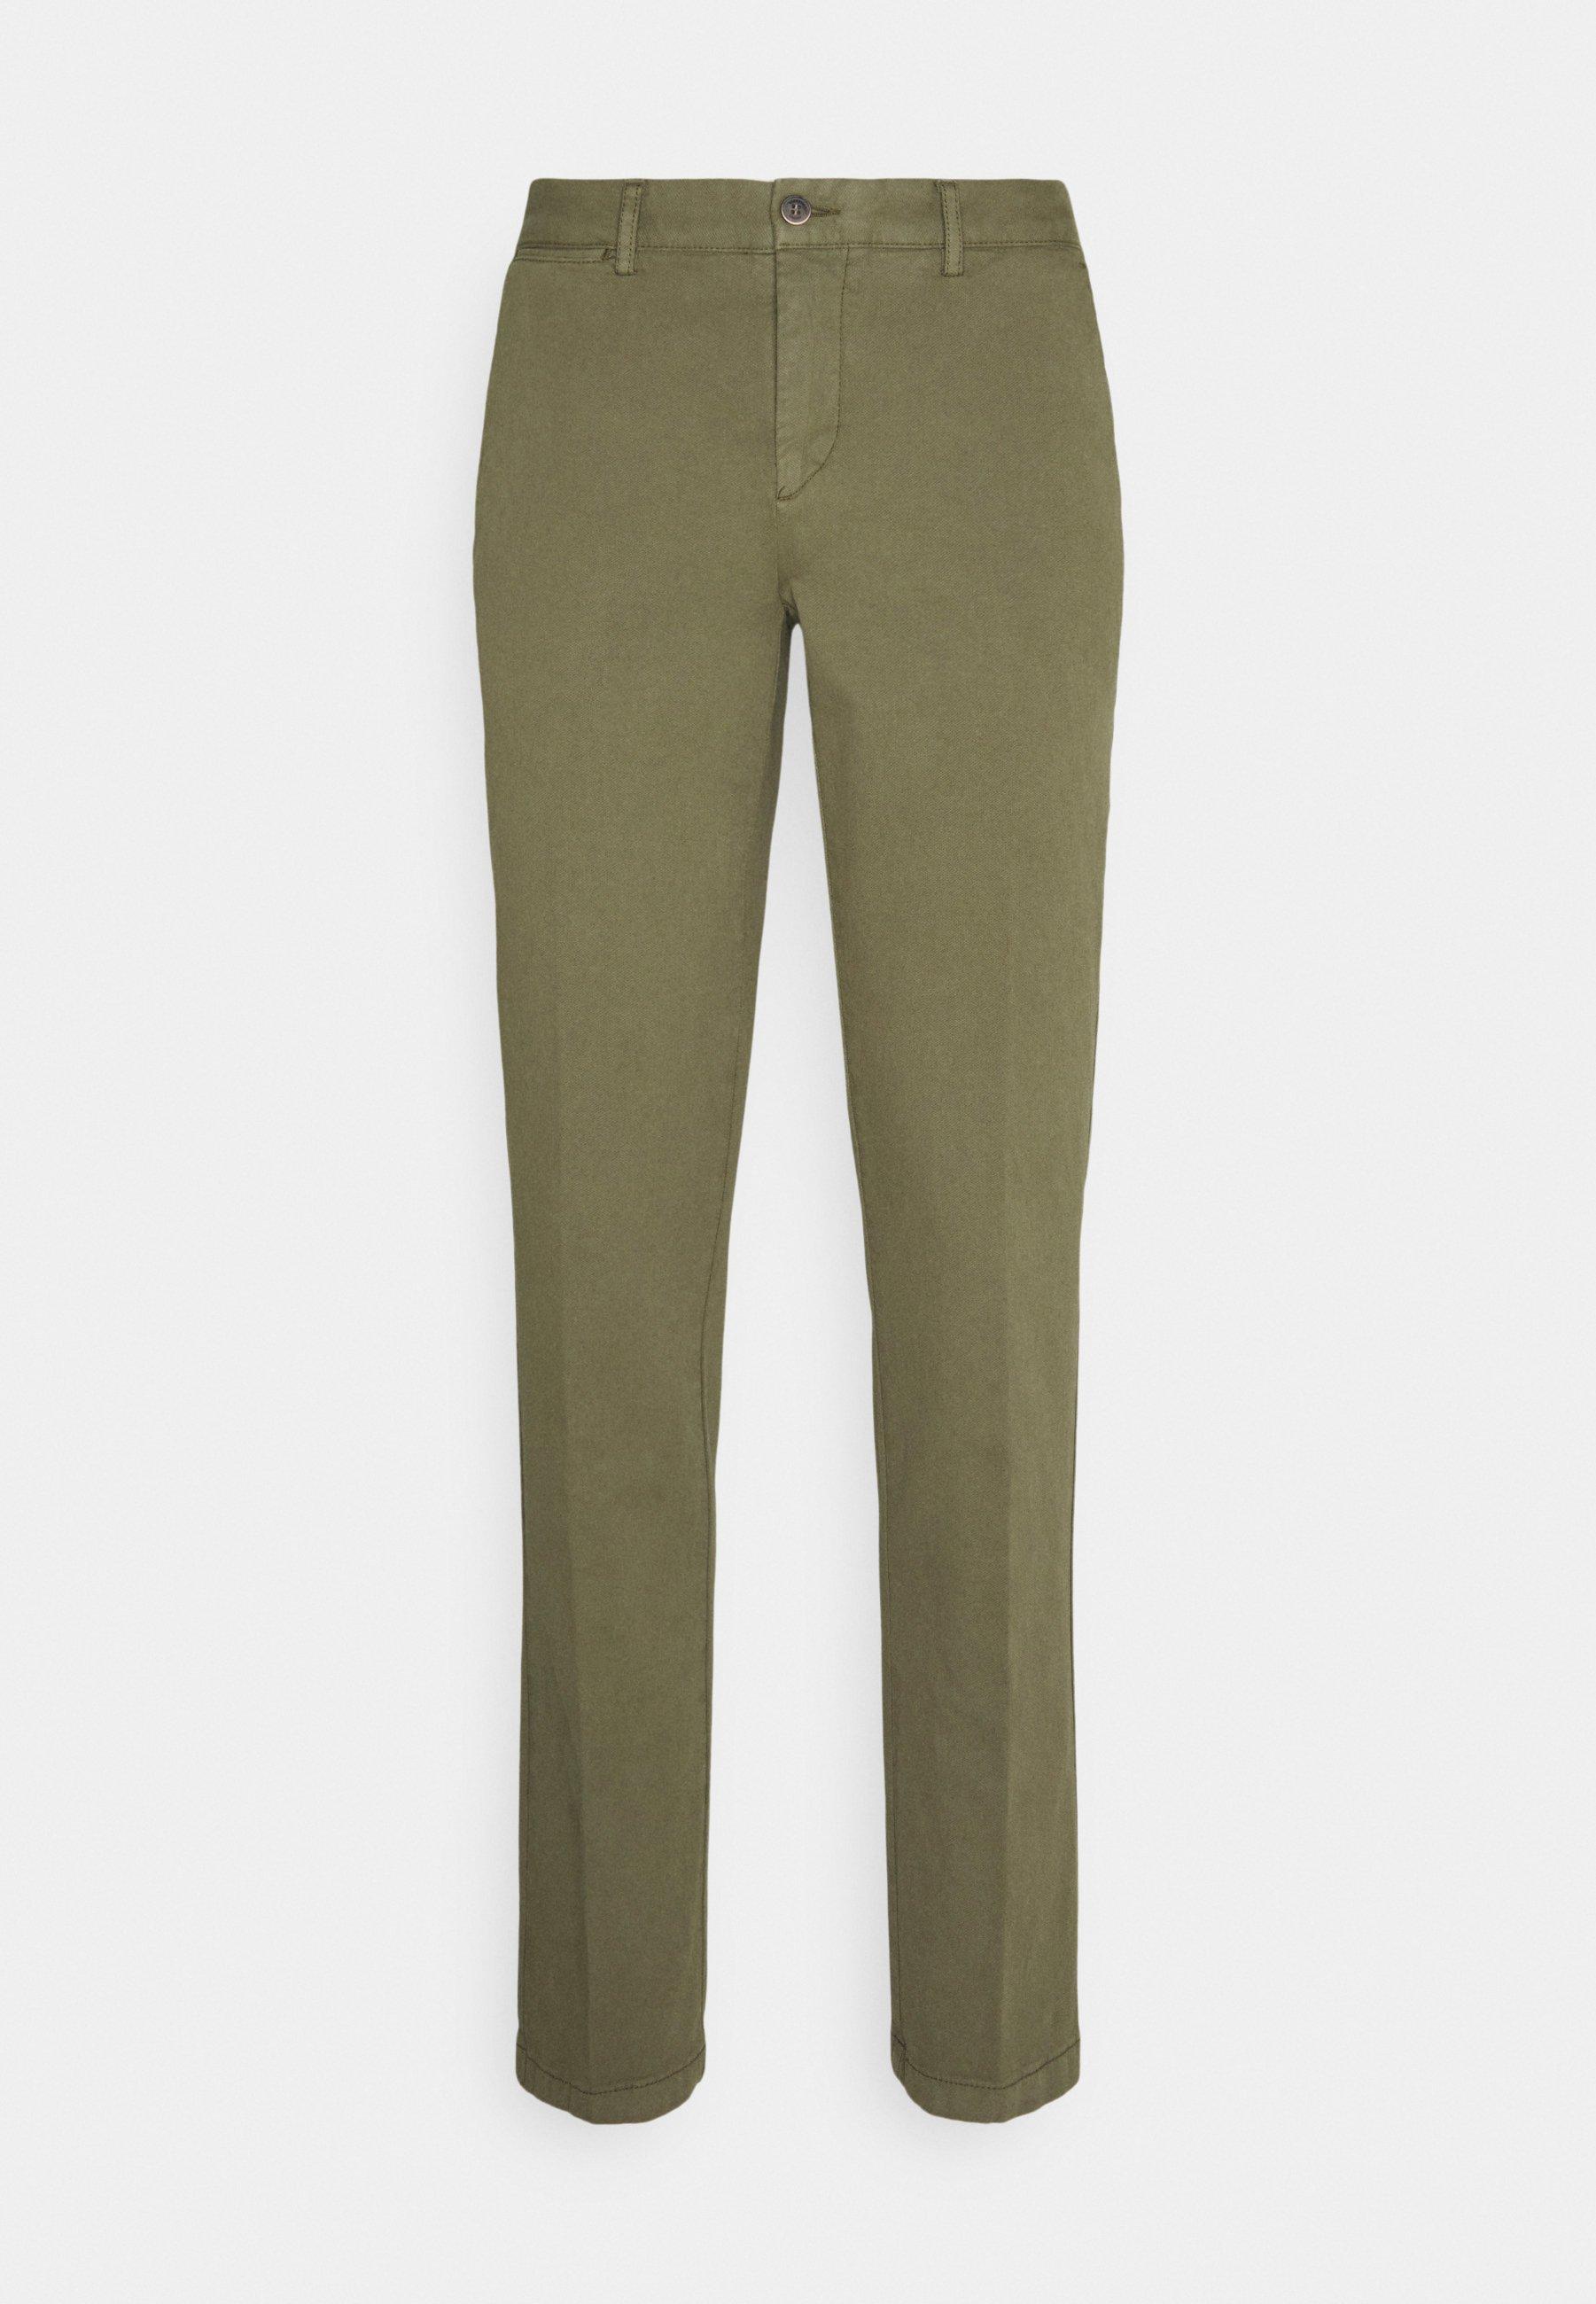 Hackett London Dye Texture - Chino Green